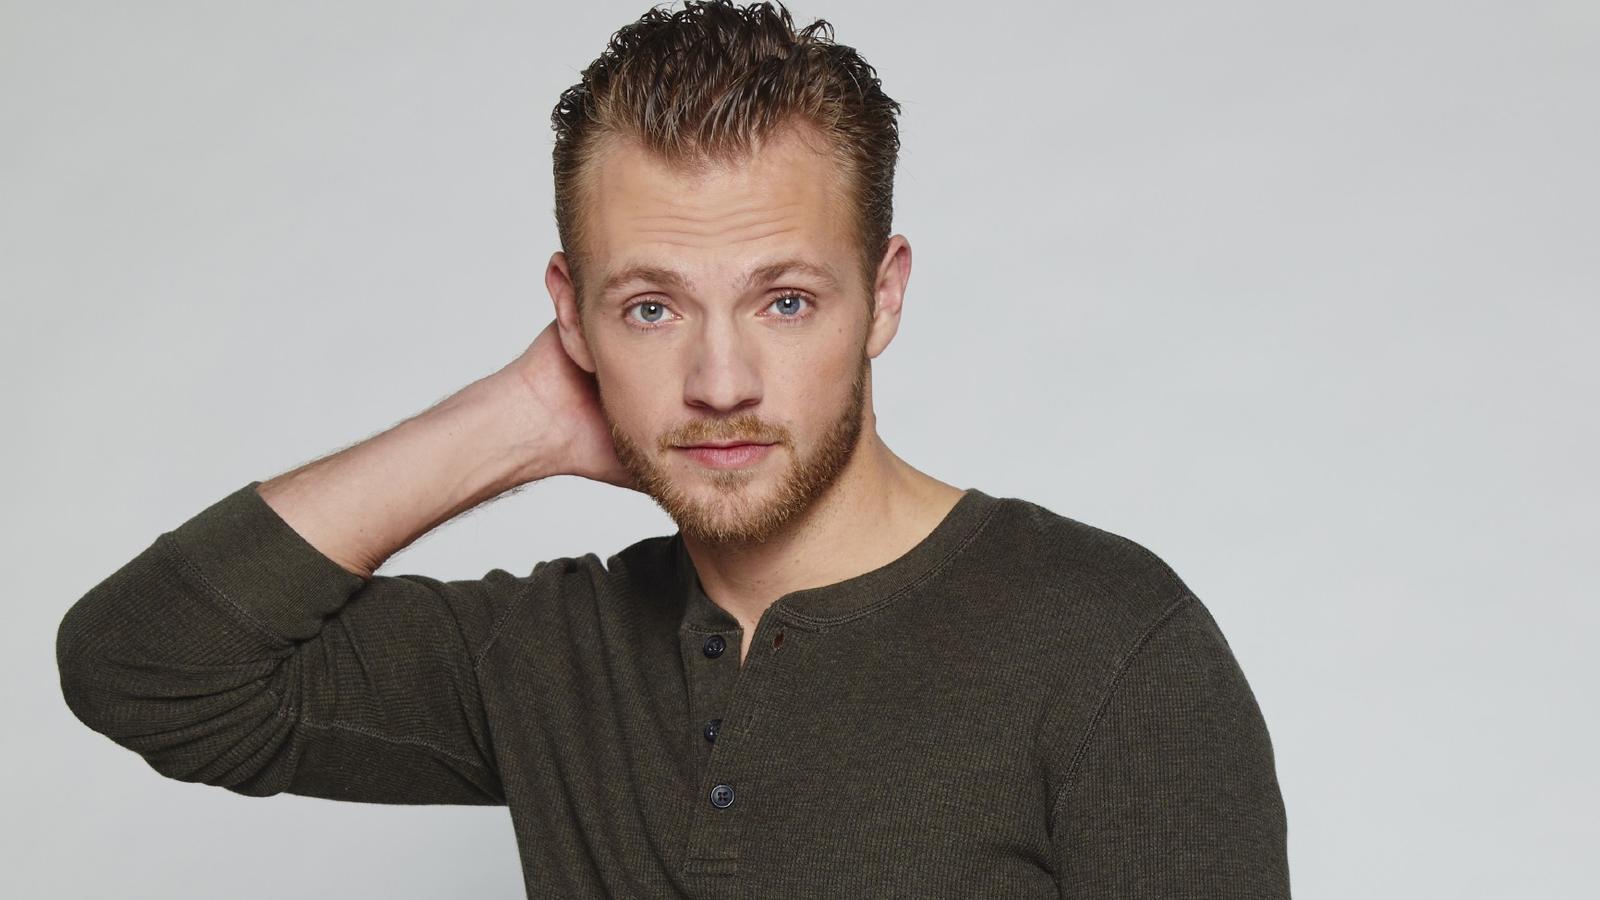 Niklas Osterloh spielt bei GZSZ die Rolle Paul Wiedmann.